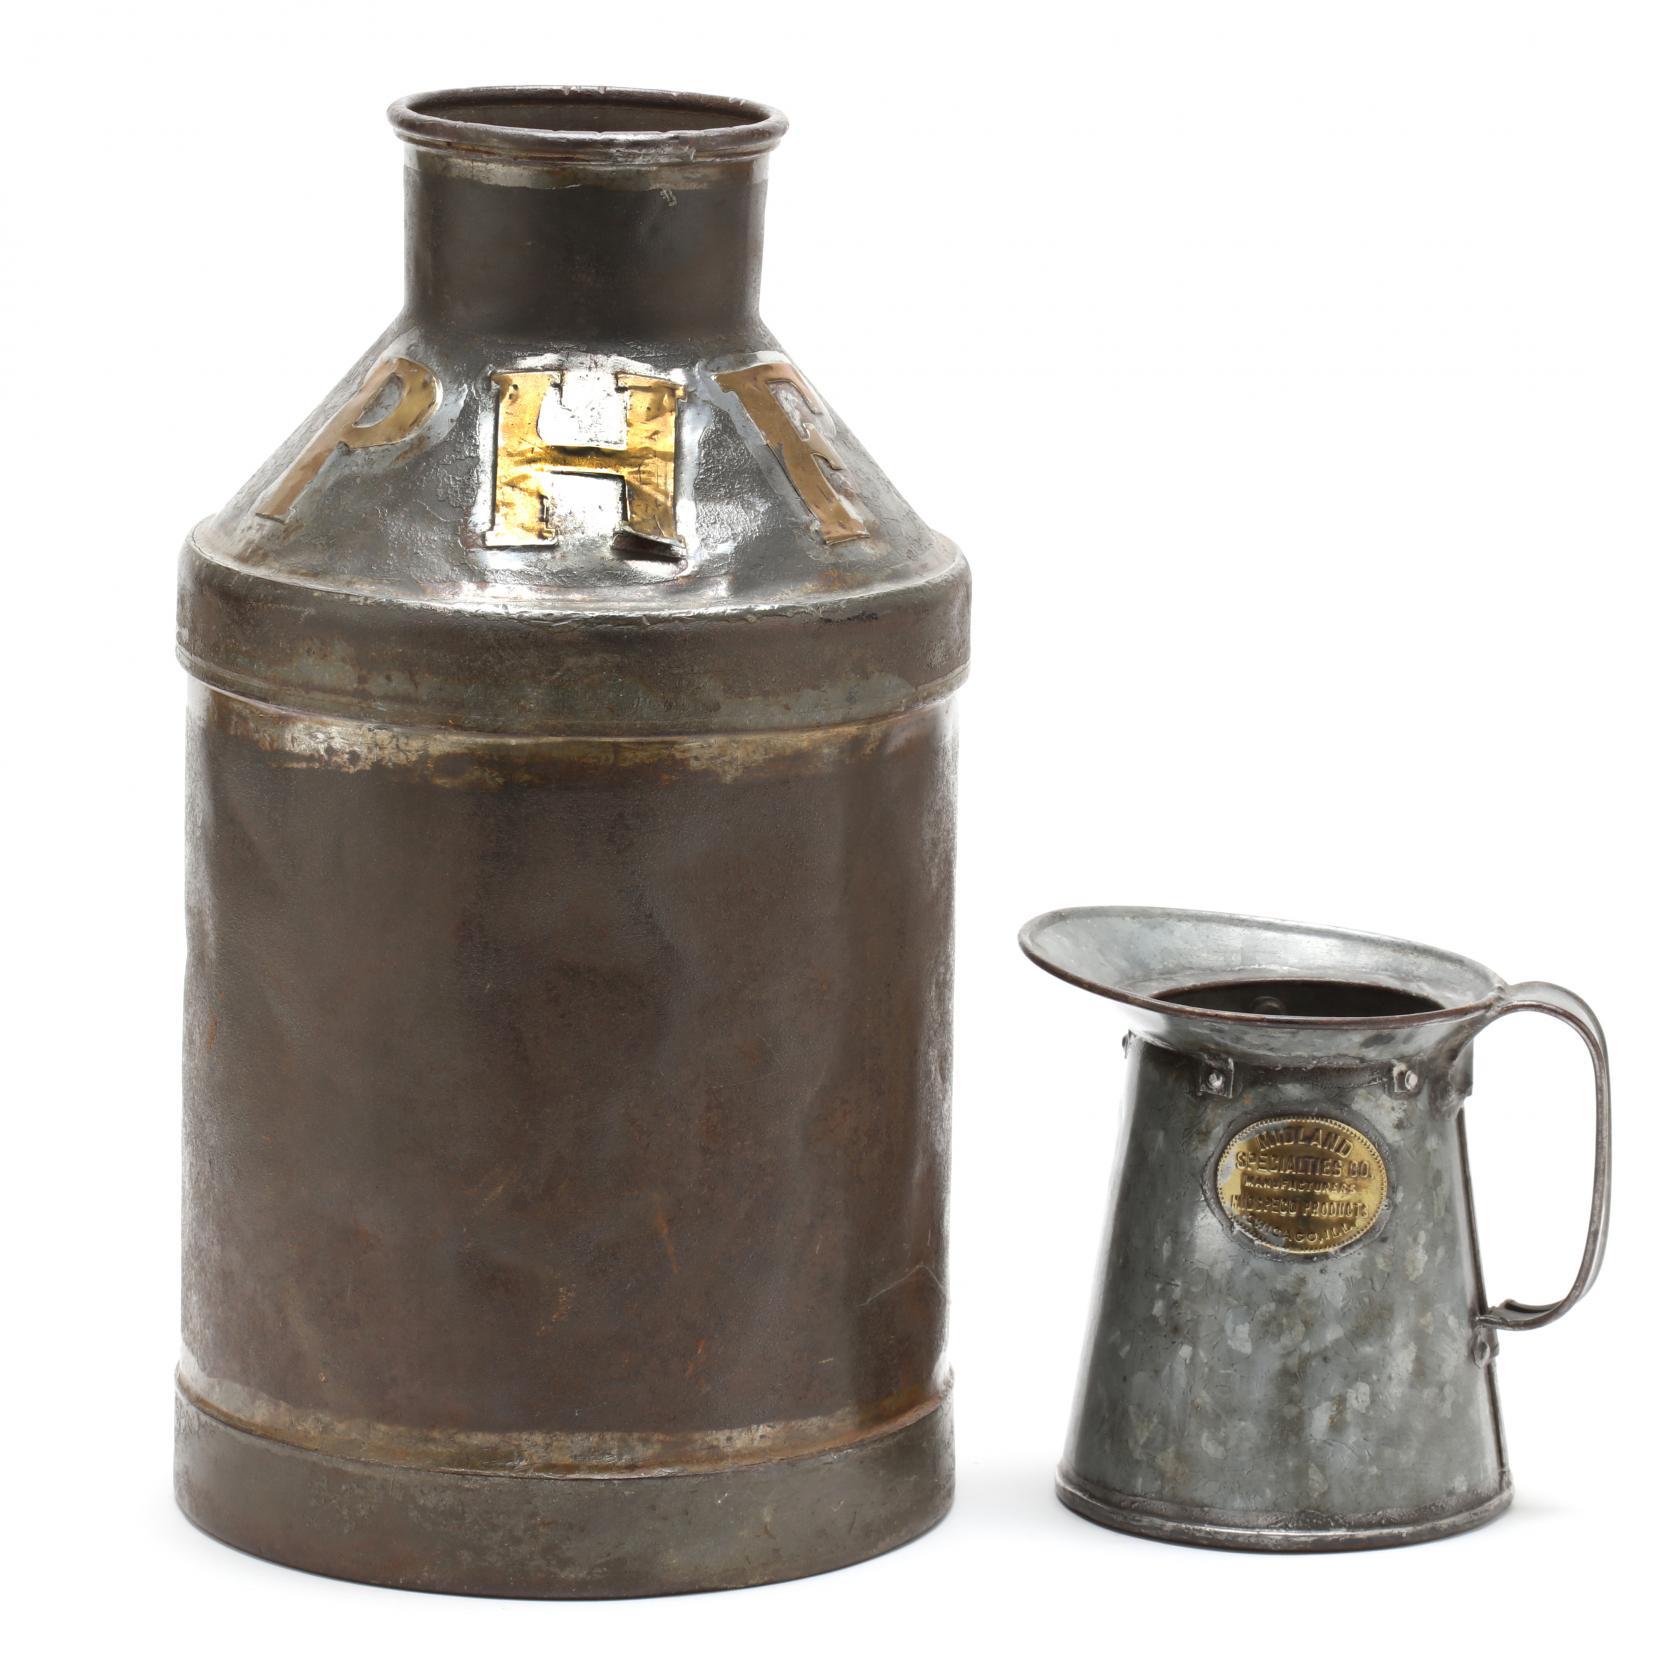 two-primitive-kitchen-items